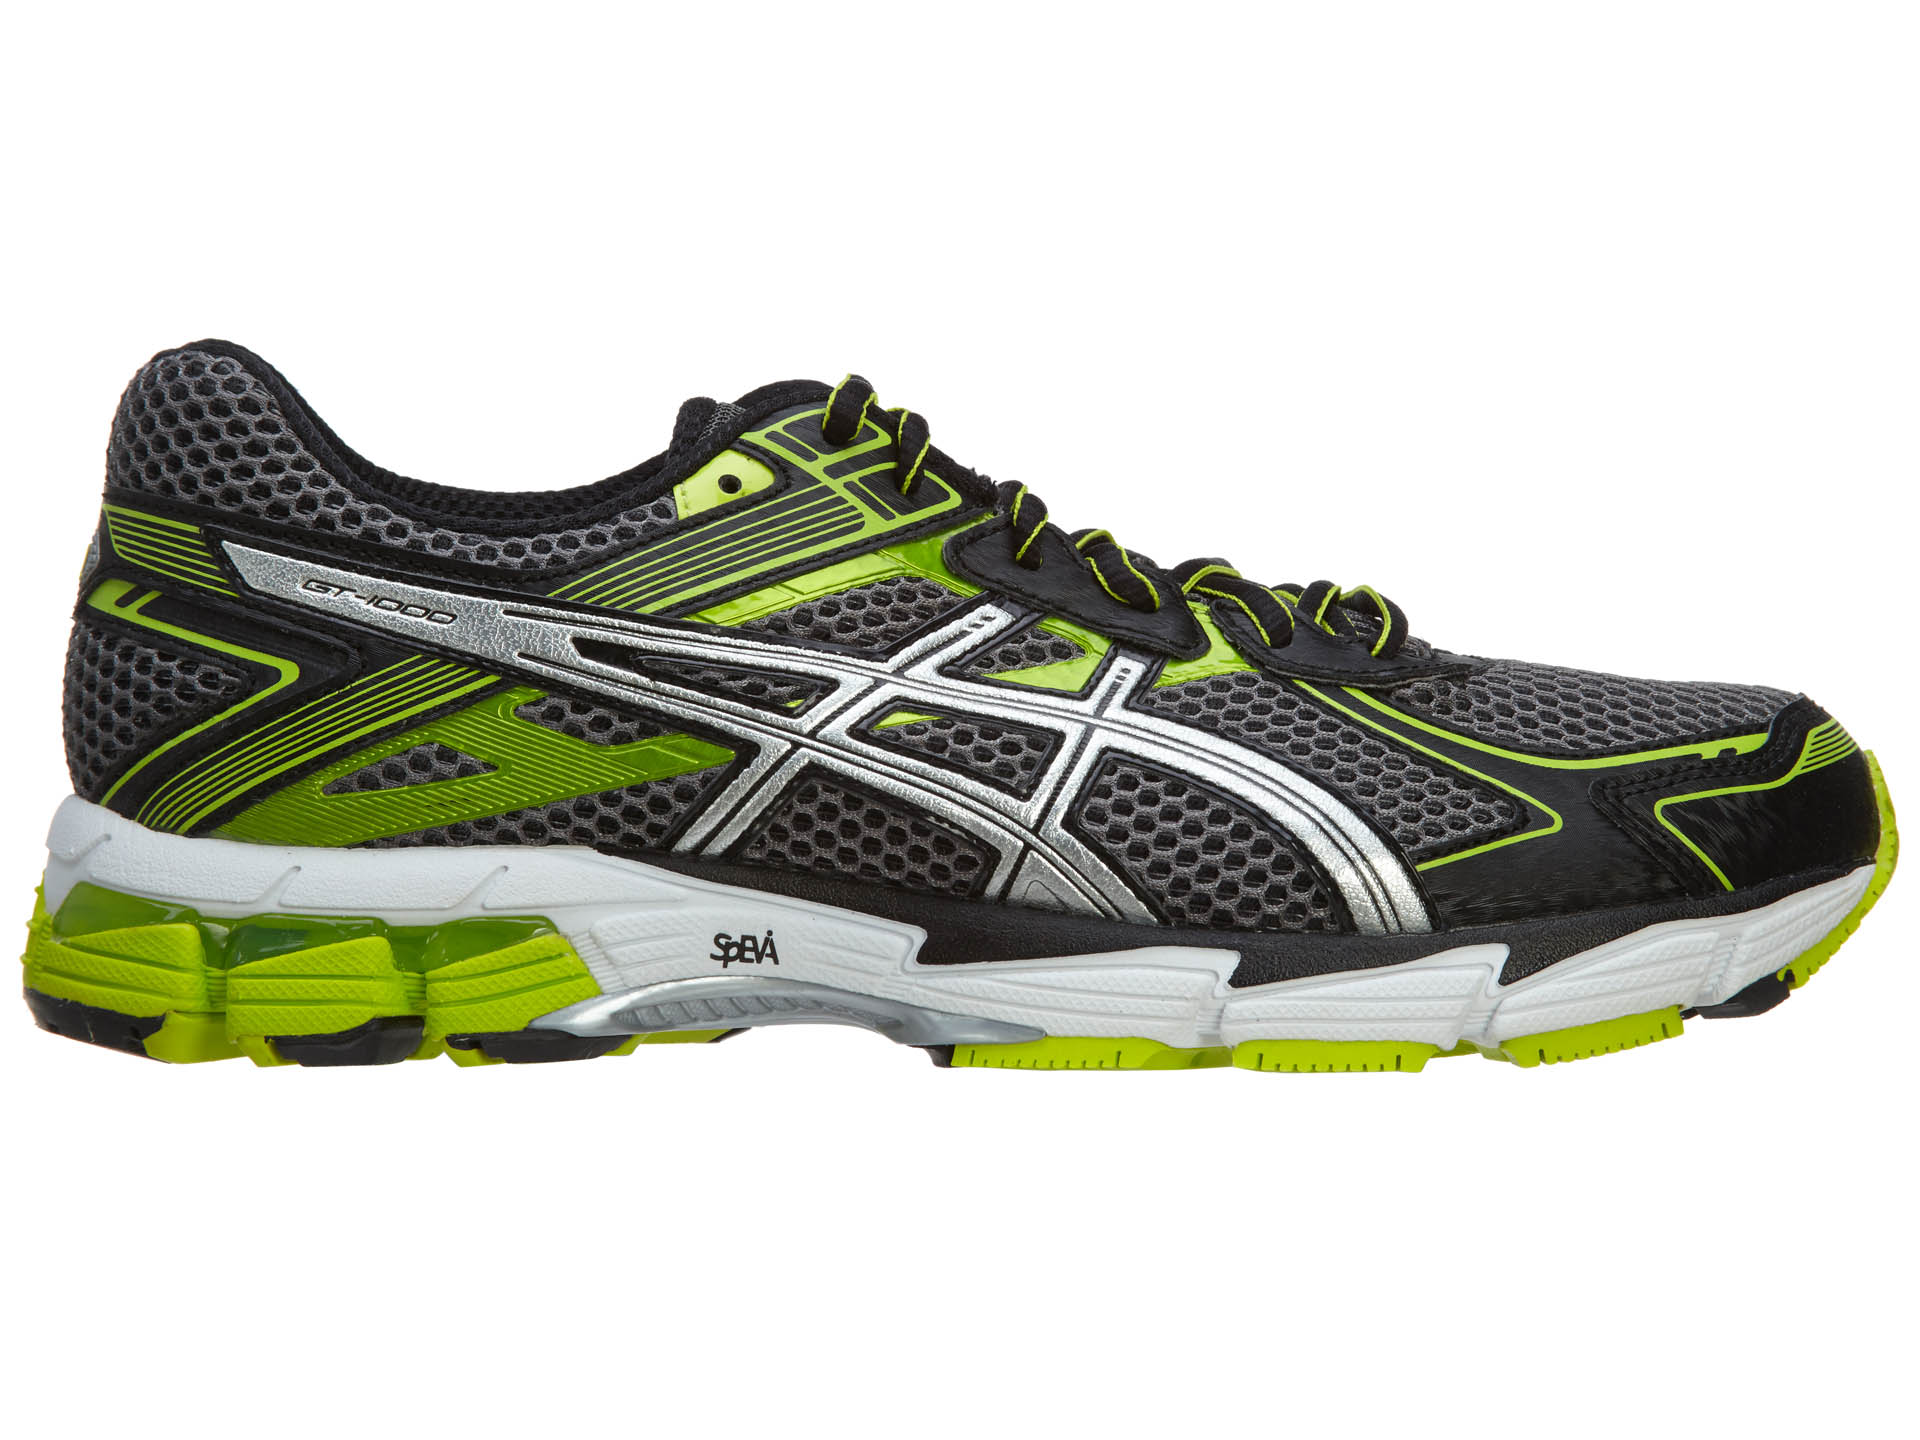 sábado estético Esperar  ASICS - ASICS Men's GT 1000 2 Running Shoe, 11 2E US - Walmart.com -  Walmart.com